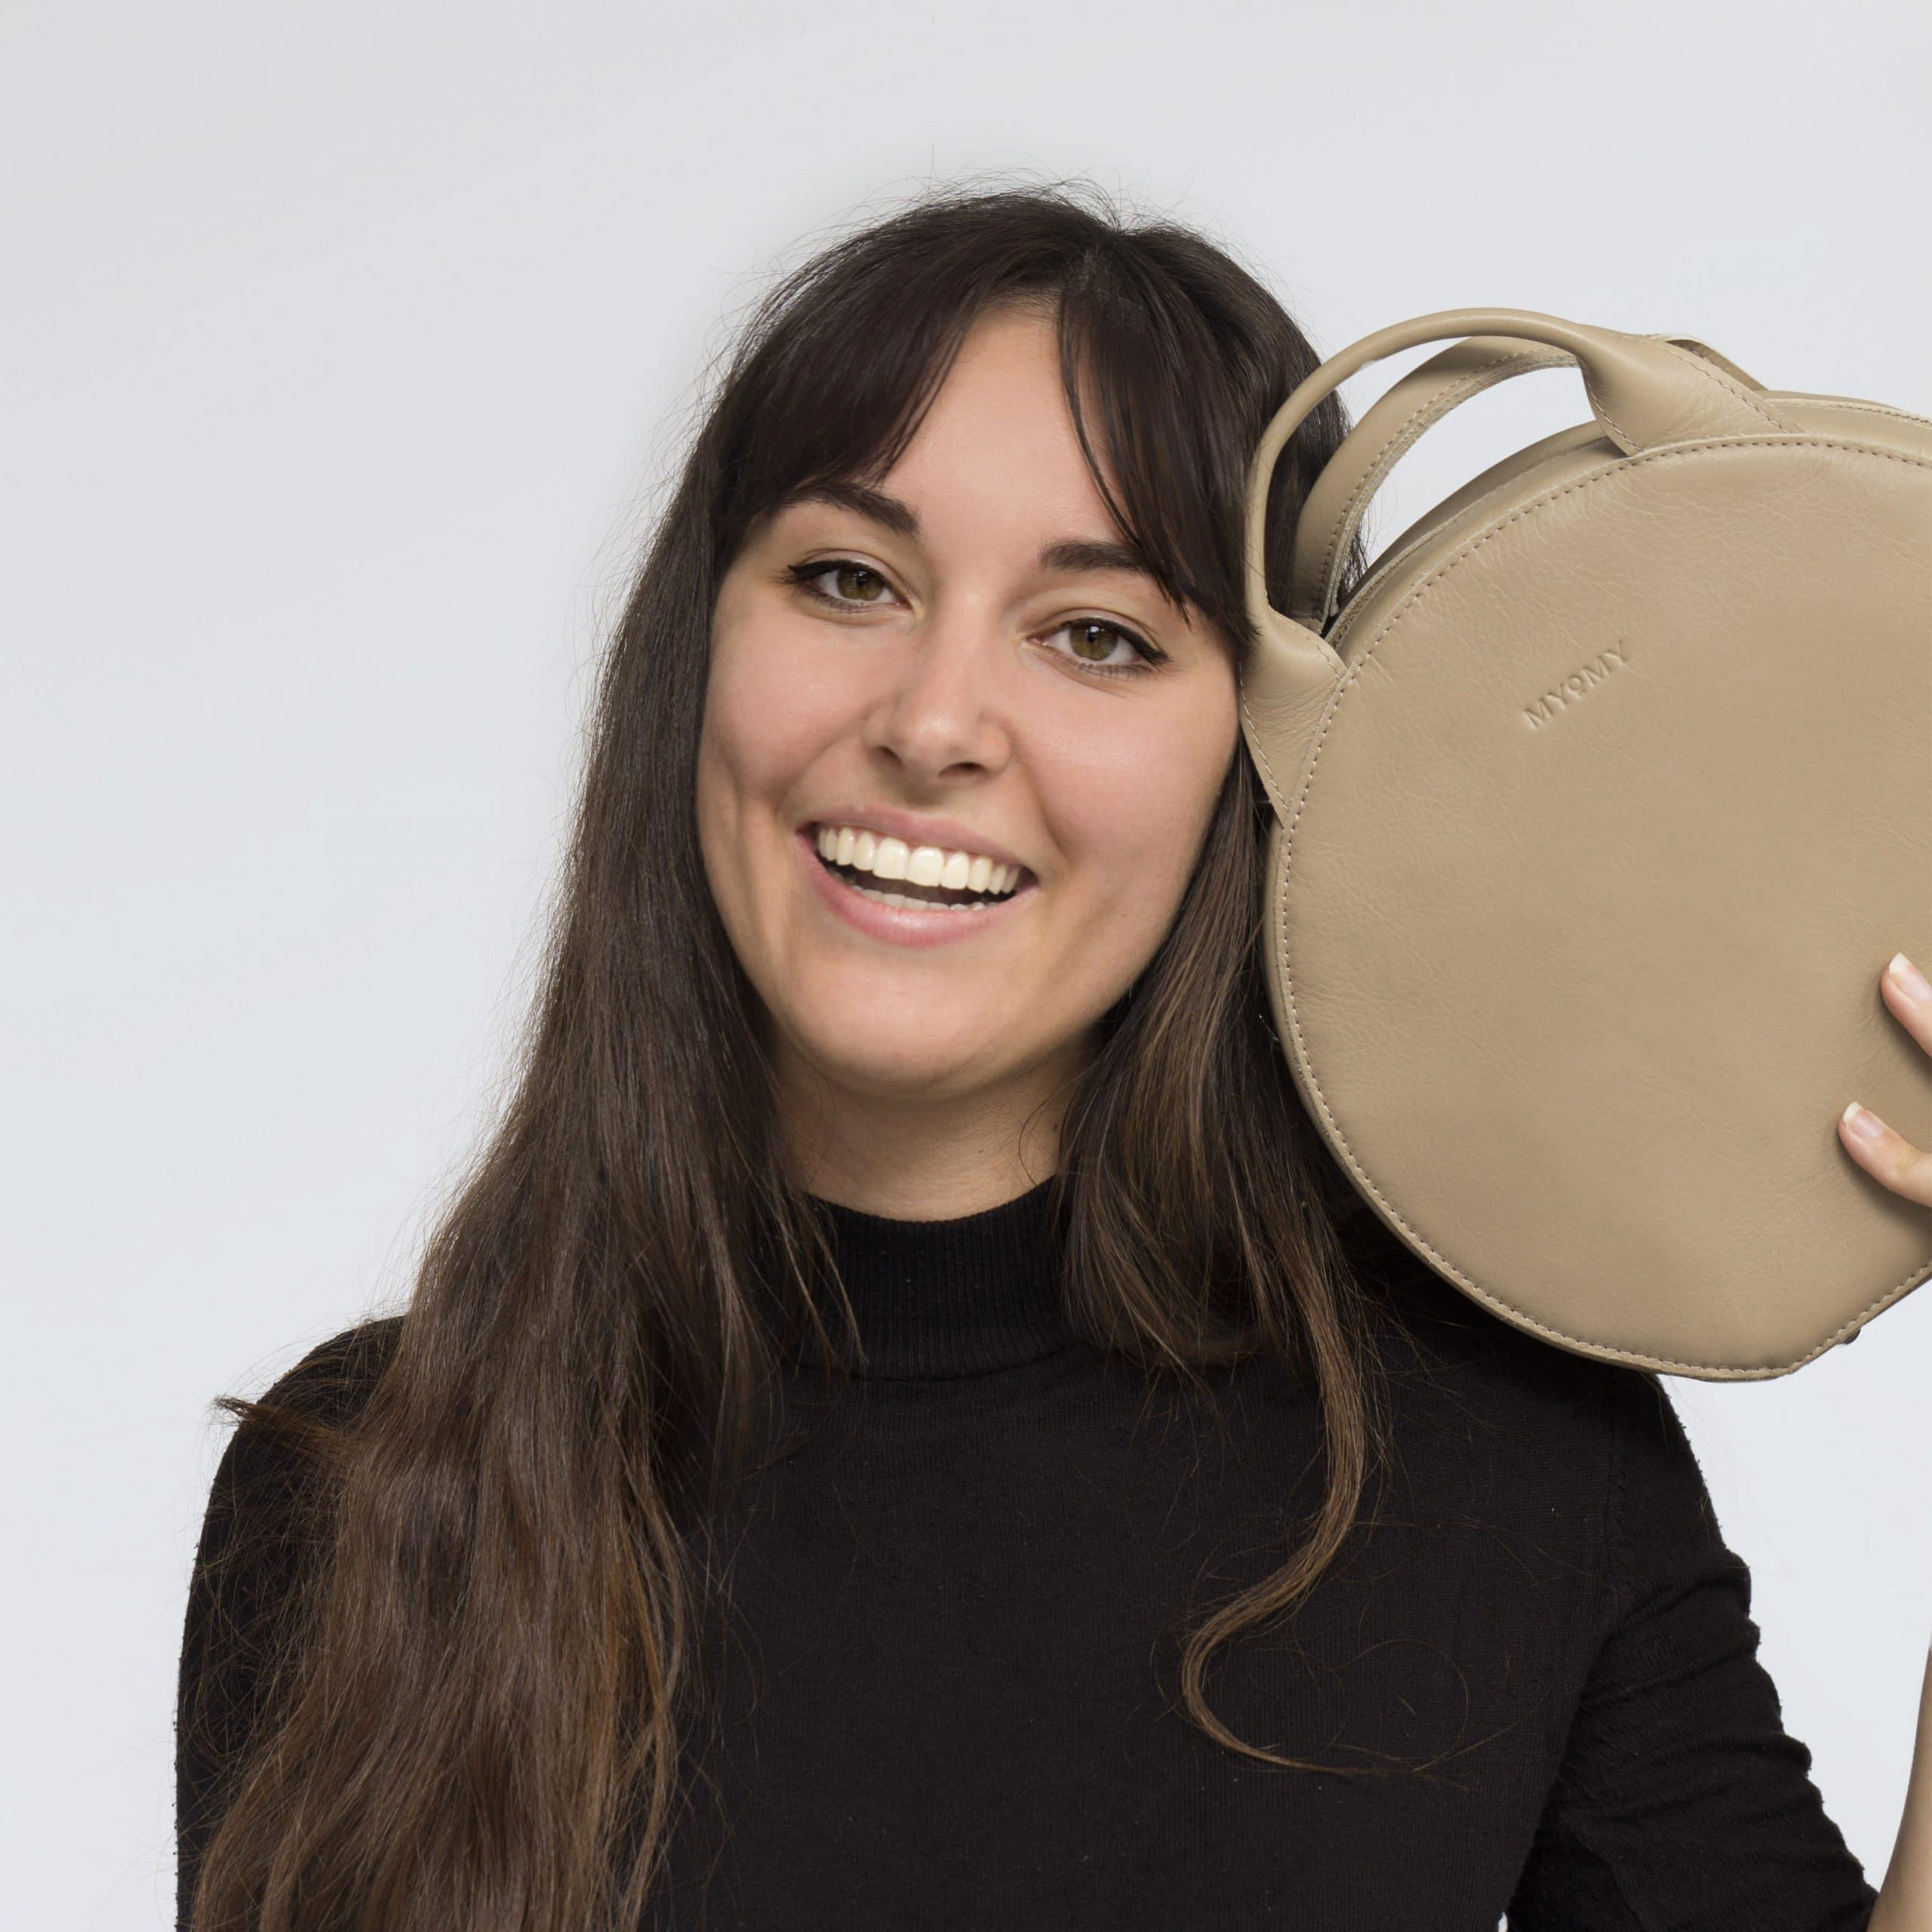 Britt Vehof - BOXY Cookie